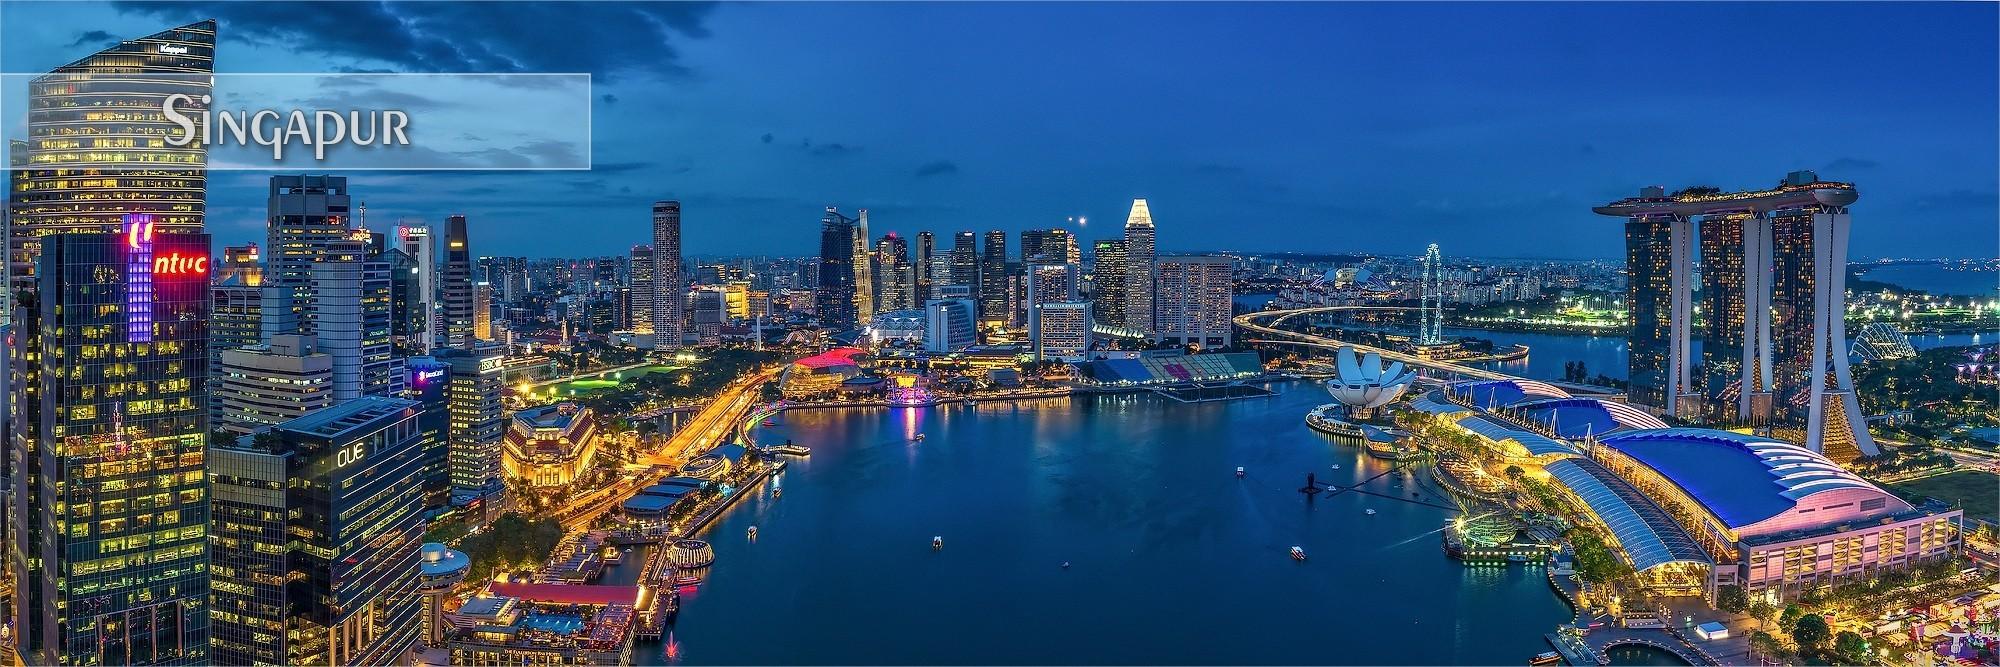 FineArt & Panoramabilder als Wandbild und Küchenrückwand aus Singapur